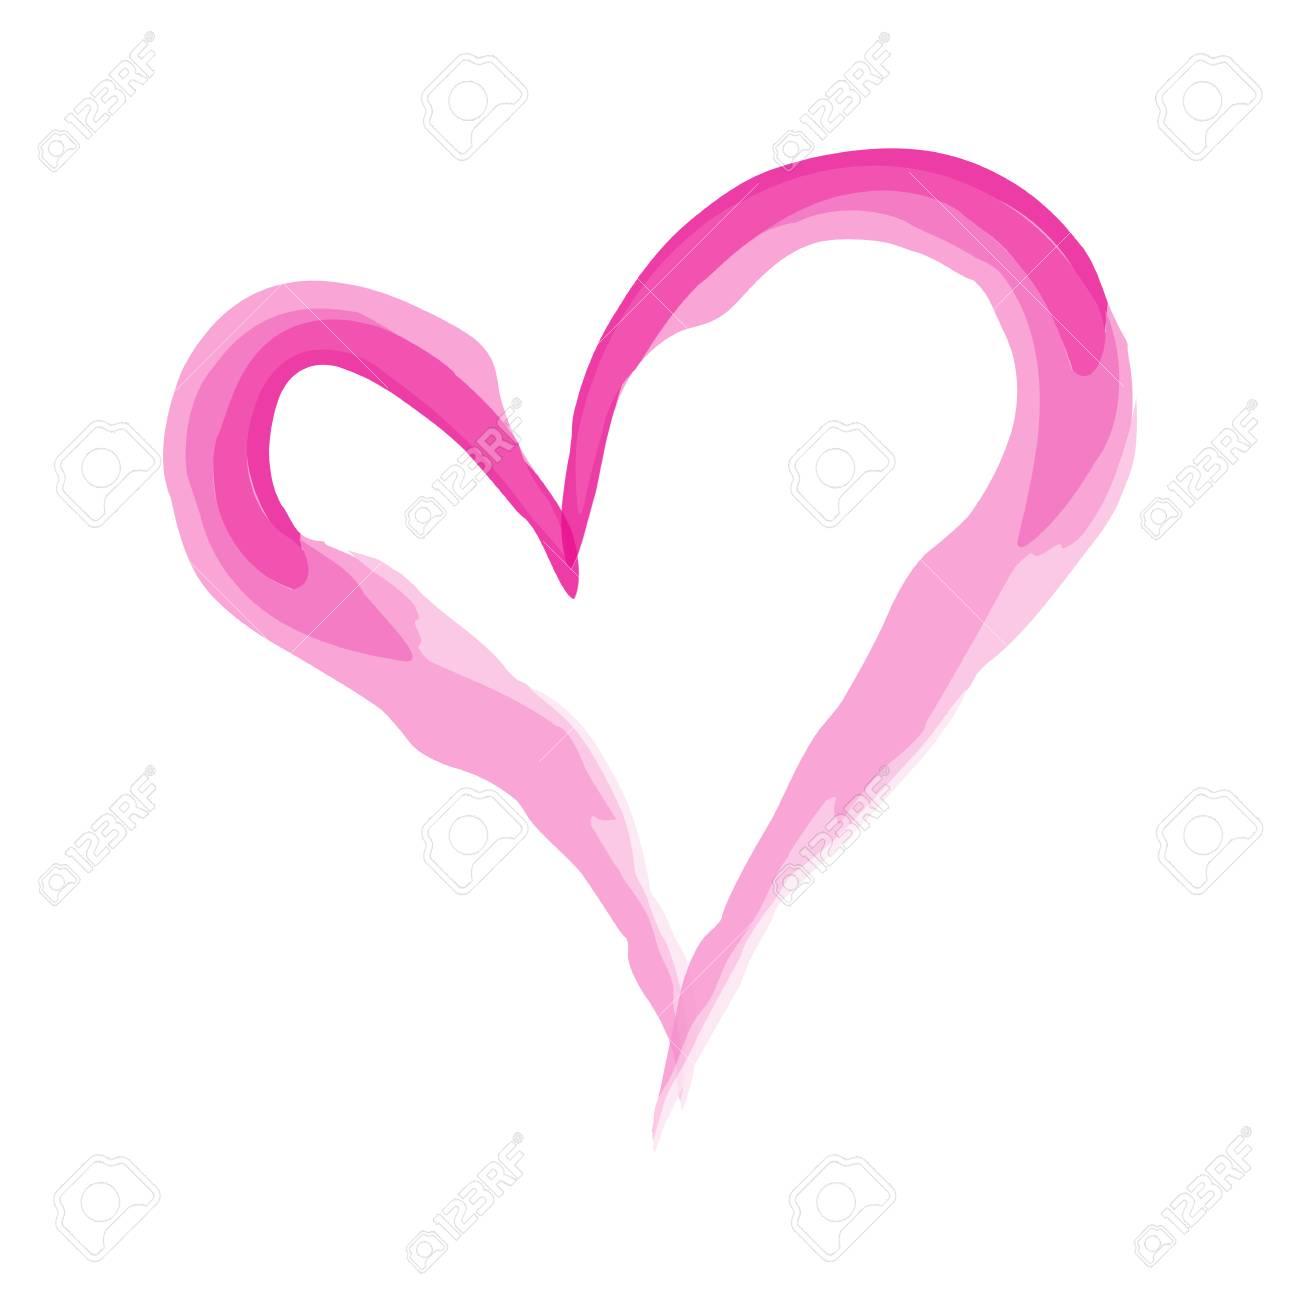 Heart Shape Design For Love Symbols Valentines Day